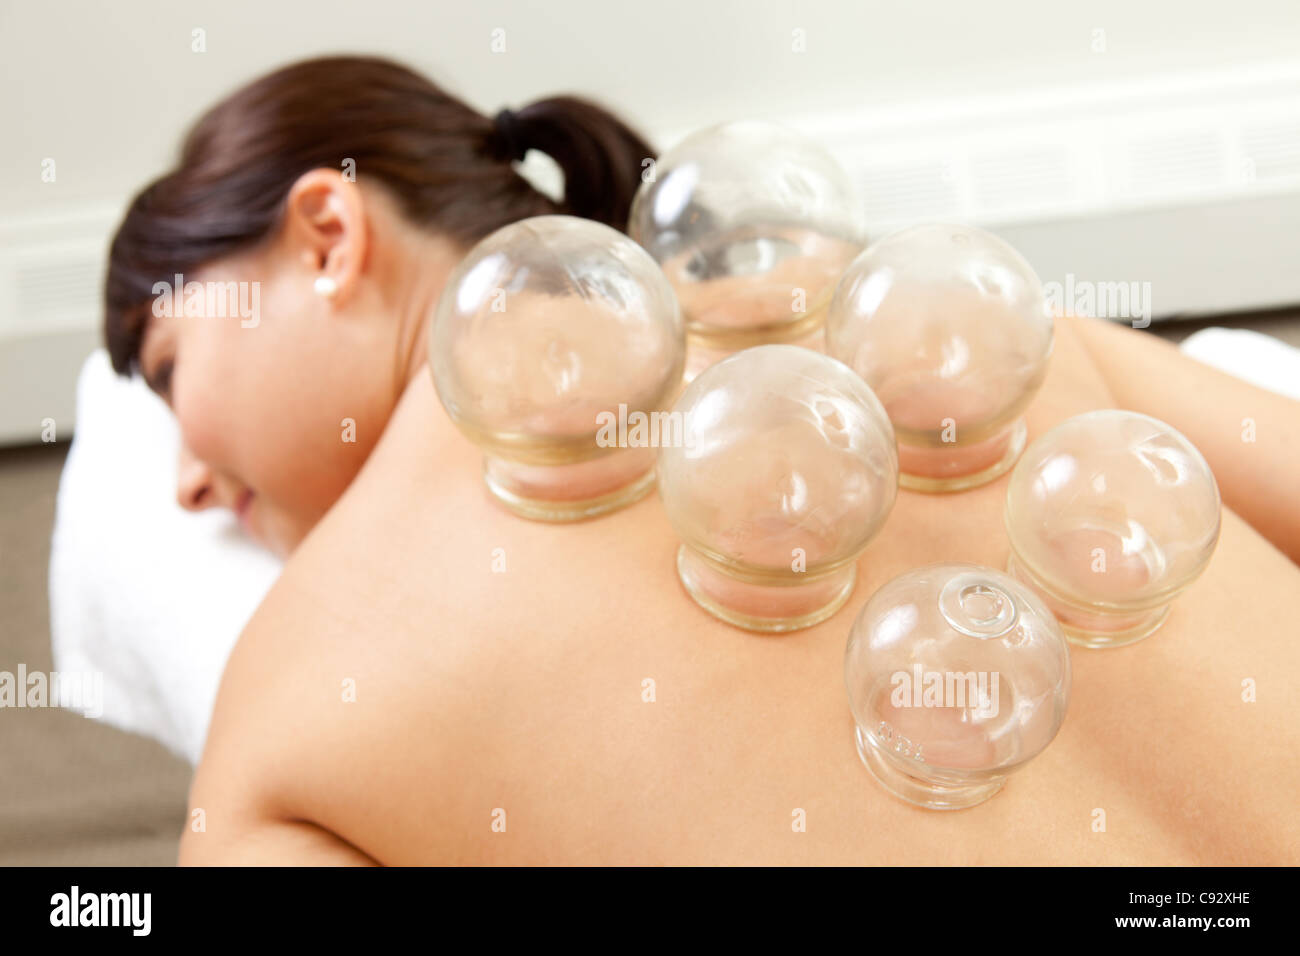 Akupunktur-Feuer Schröpfen Detail am Rücken Frau Stockbild